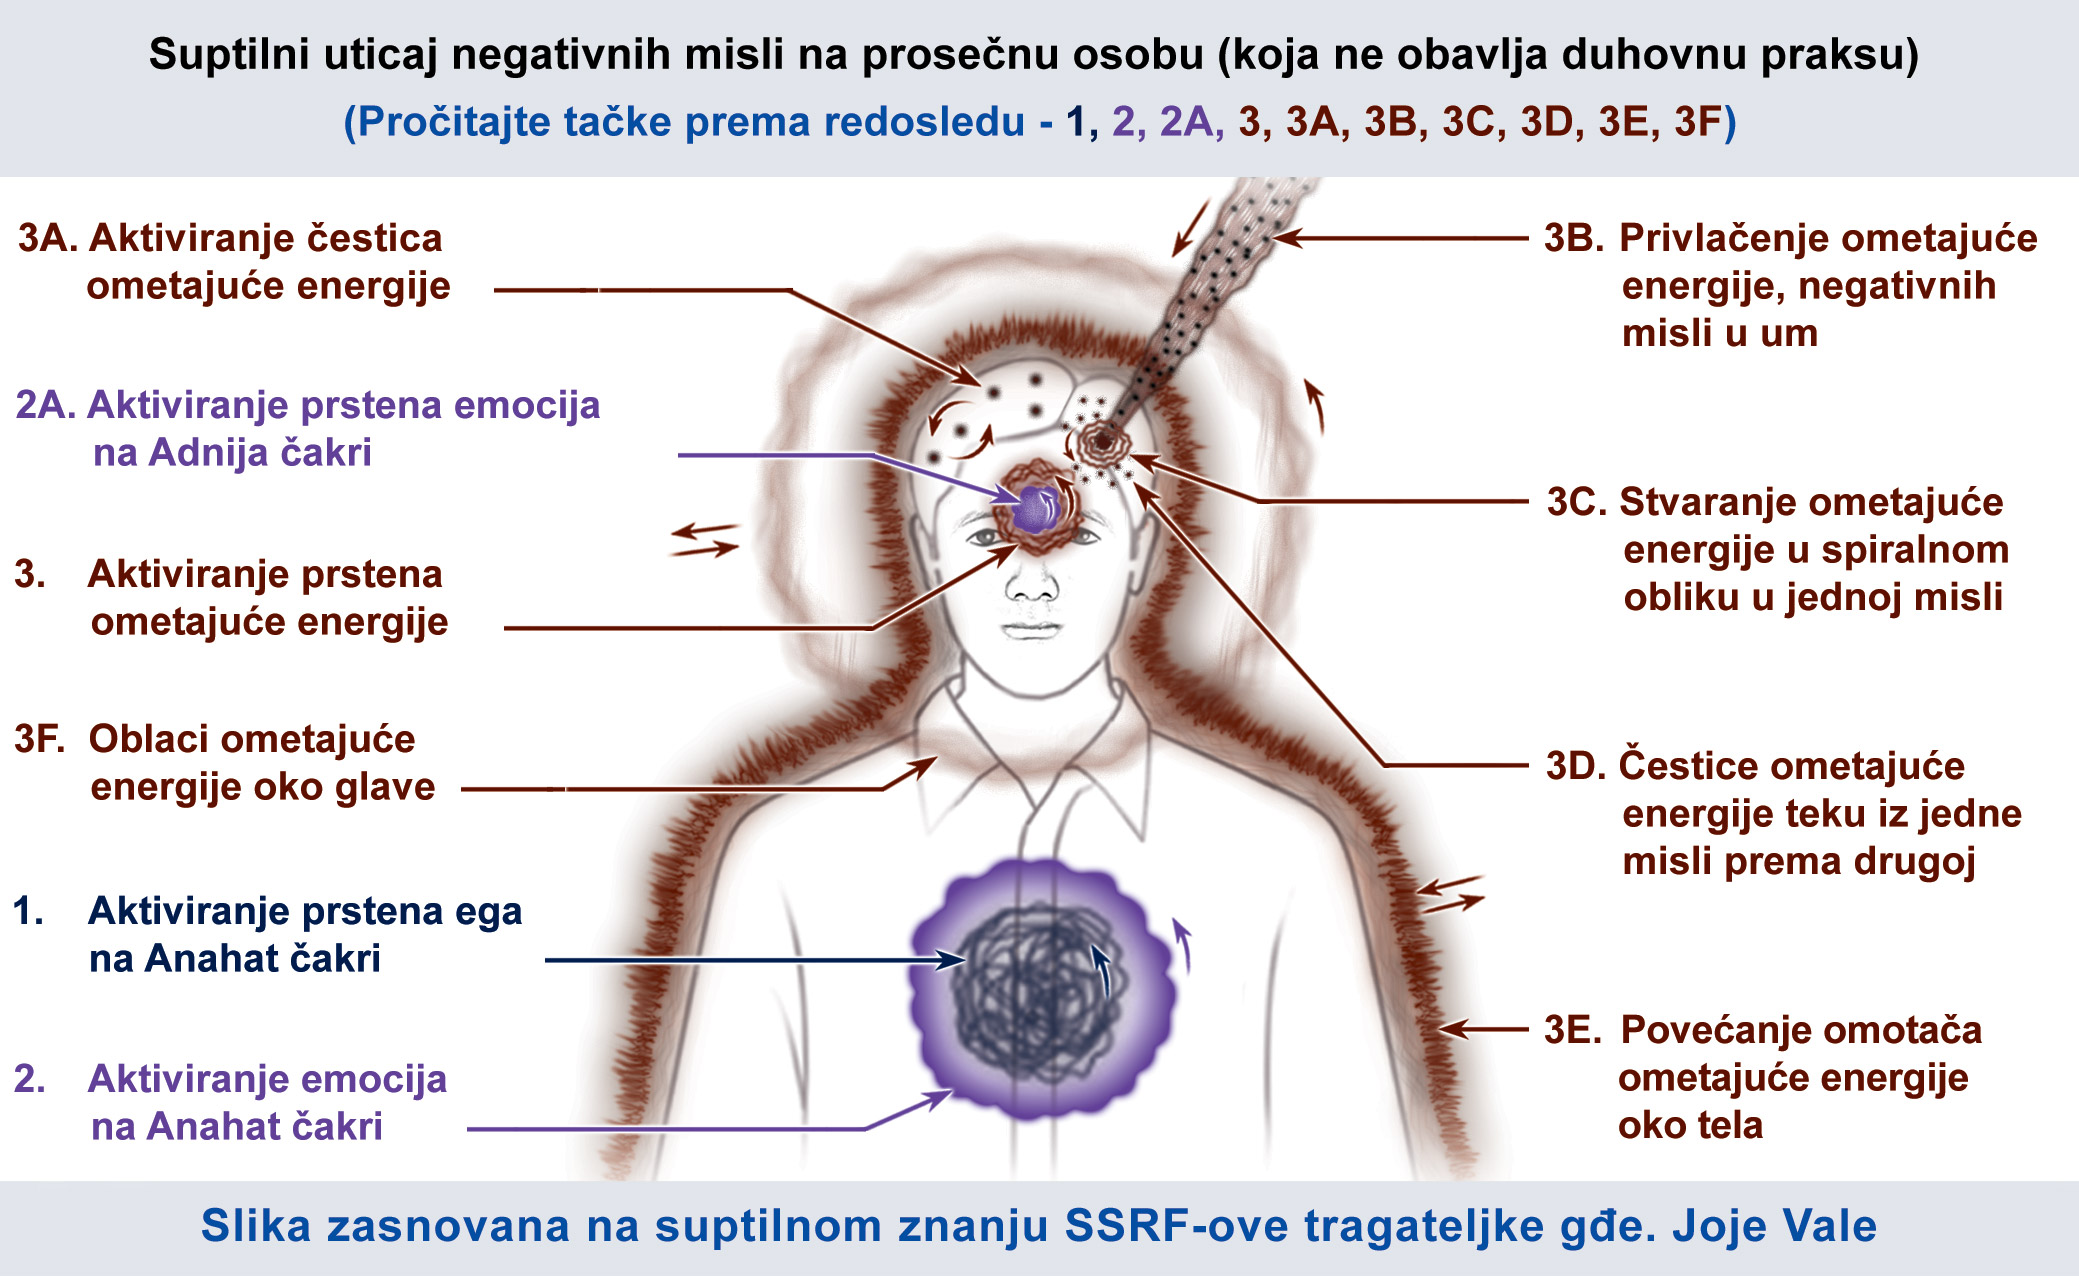 Kako da zaustavitmo negativne misli